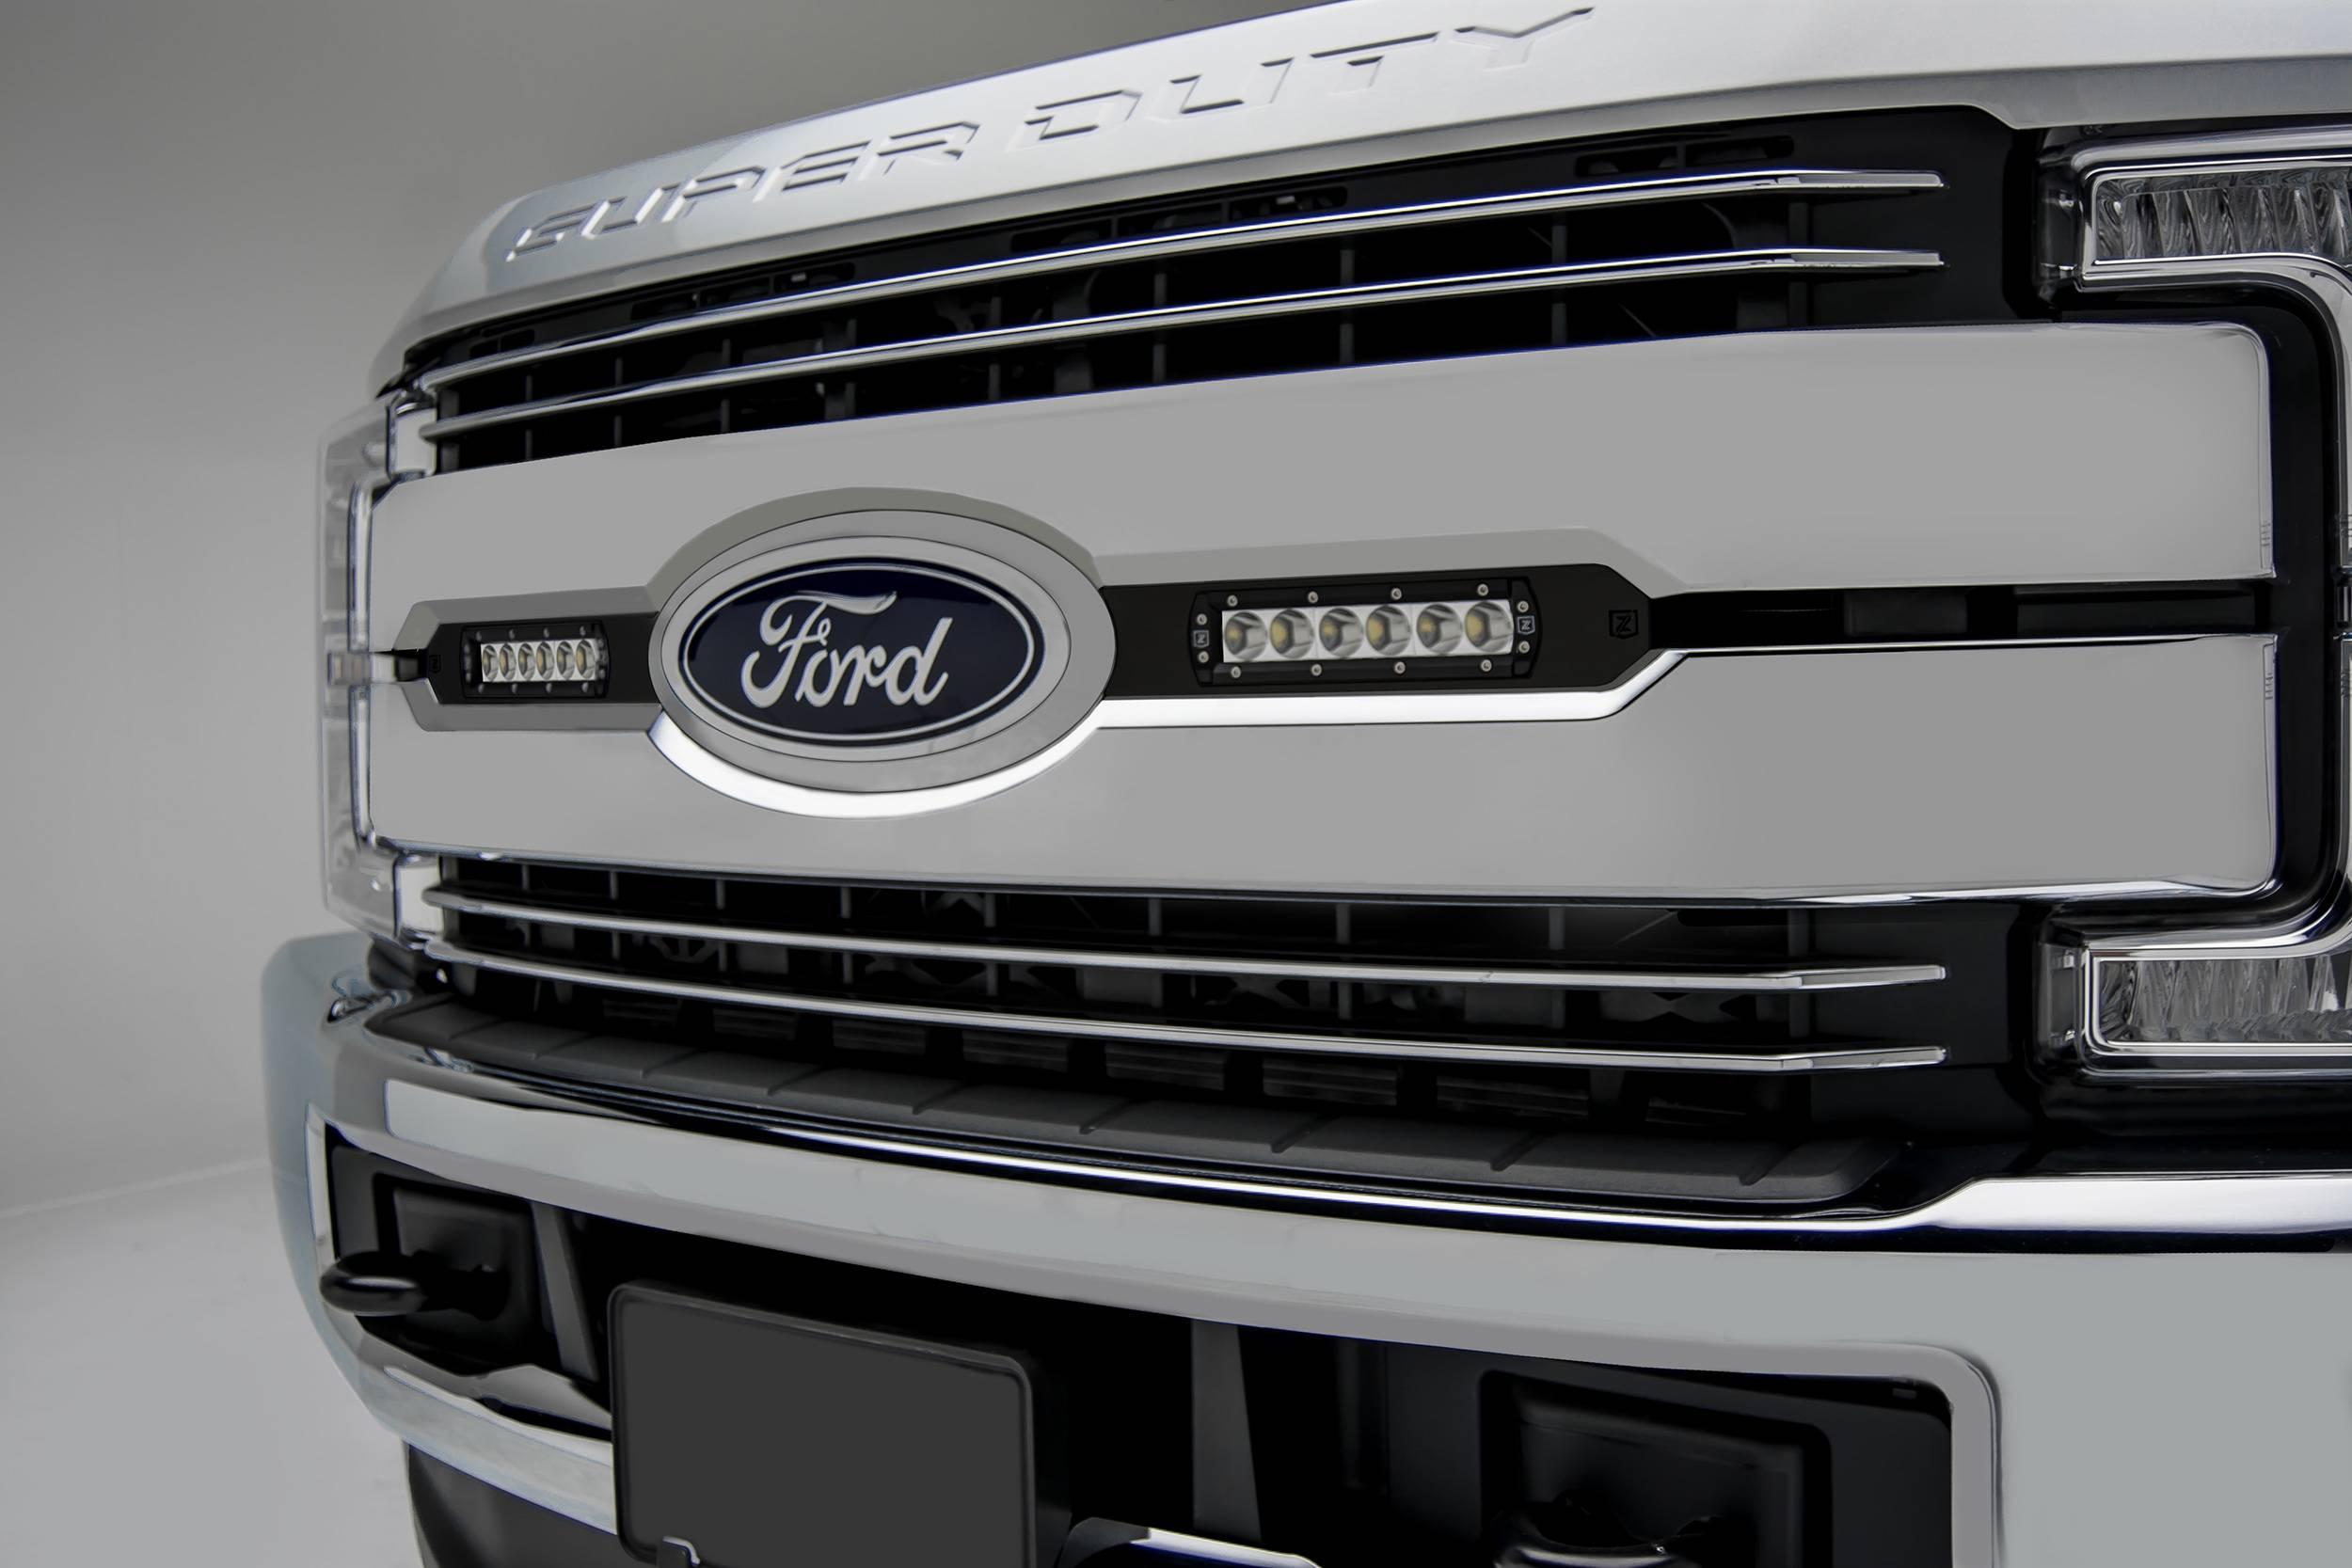 ZROADZ                                             - 2017-2019 Ford Super Duty Lariat, King Ranch OEM Grille LED Kit, Incl. (2) 6 Inch LED Straight Single Row Slim Light Bars - PN #Z415471-KIT